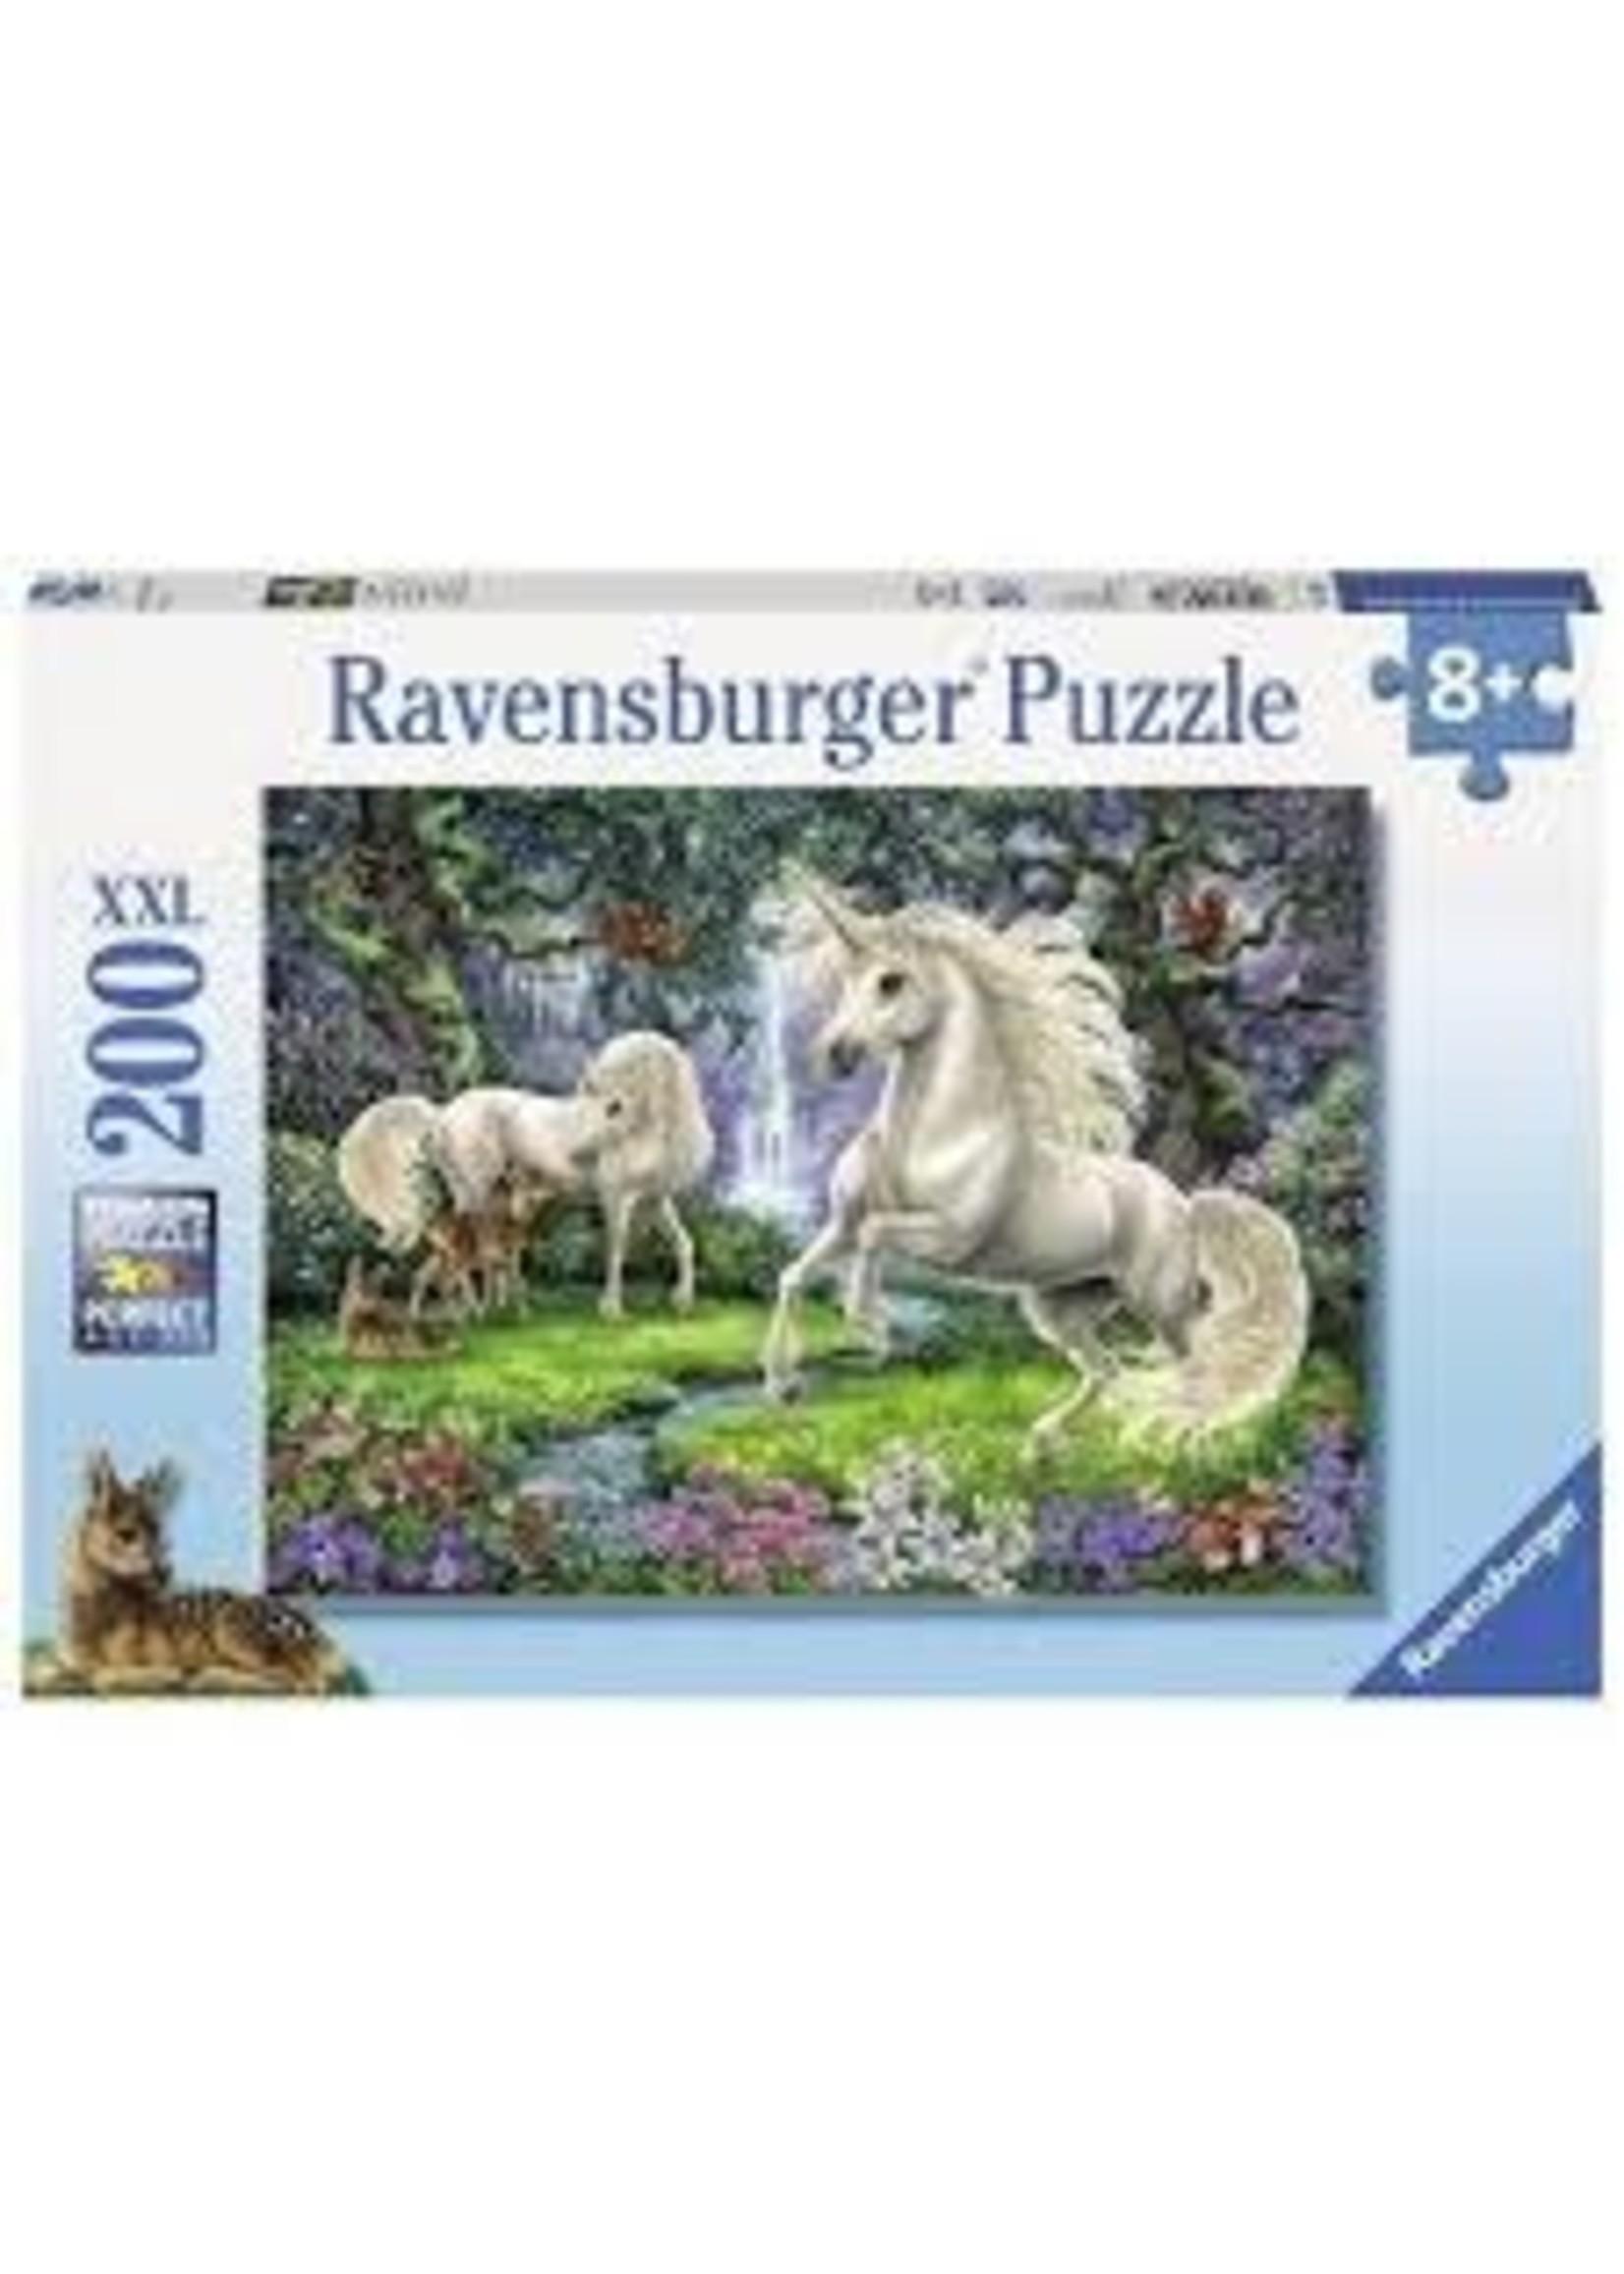 Ravensburger 200pc XXL Puzzle Mystical Unicorn